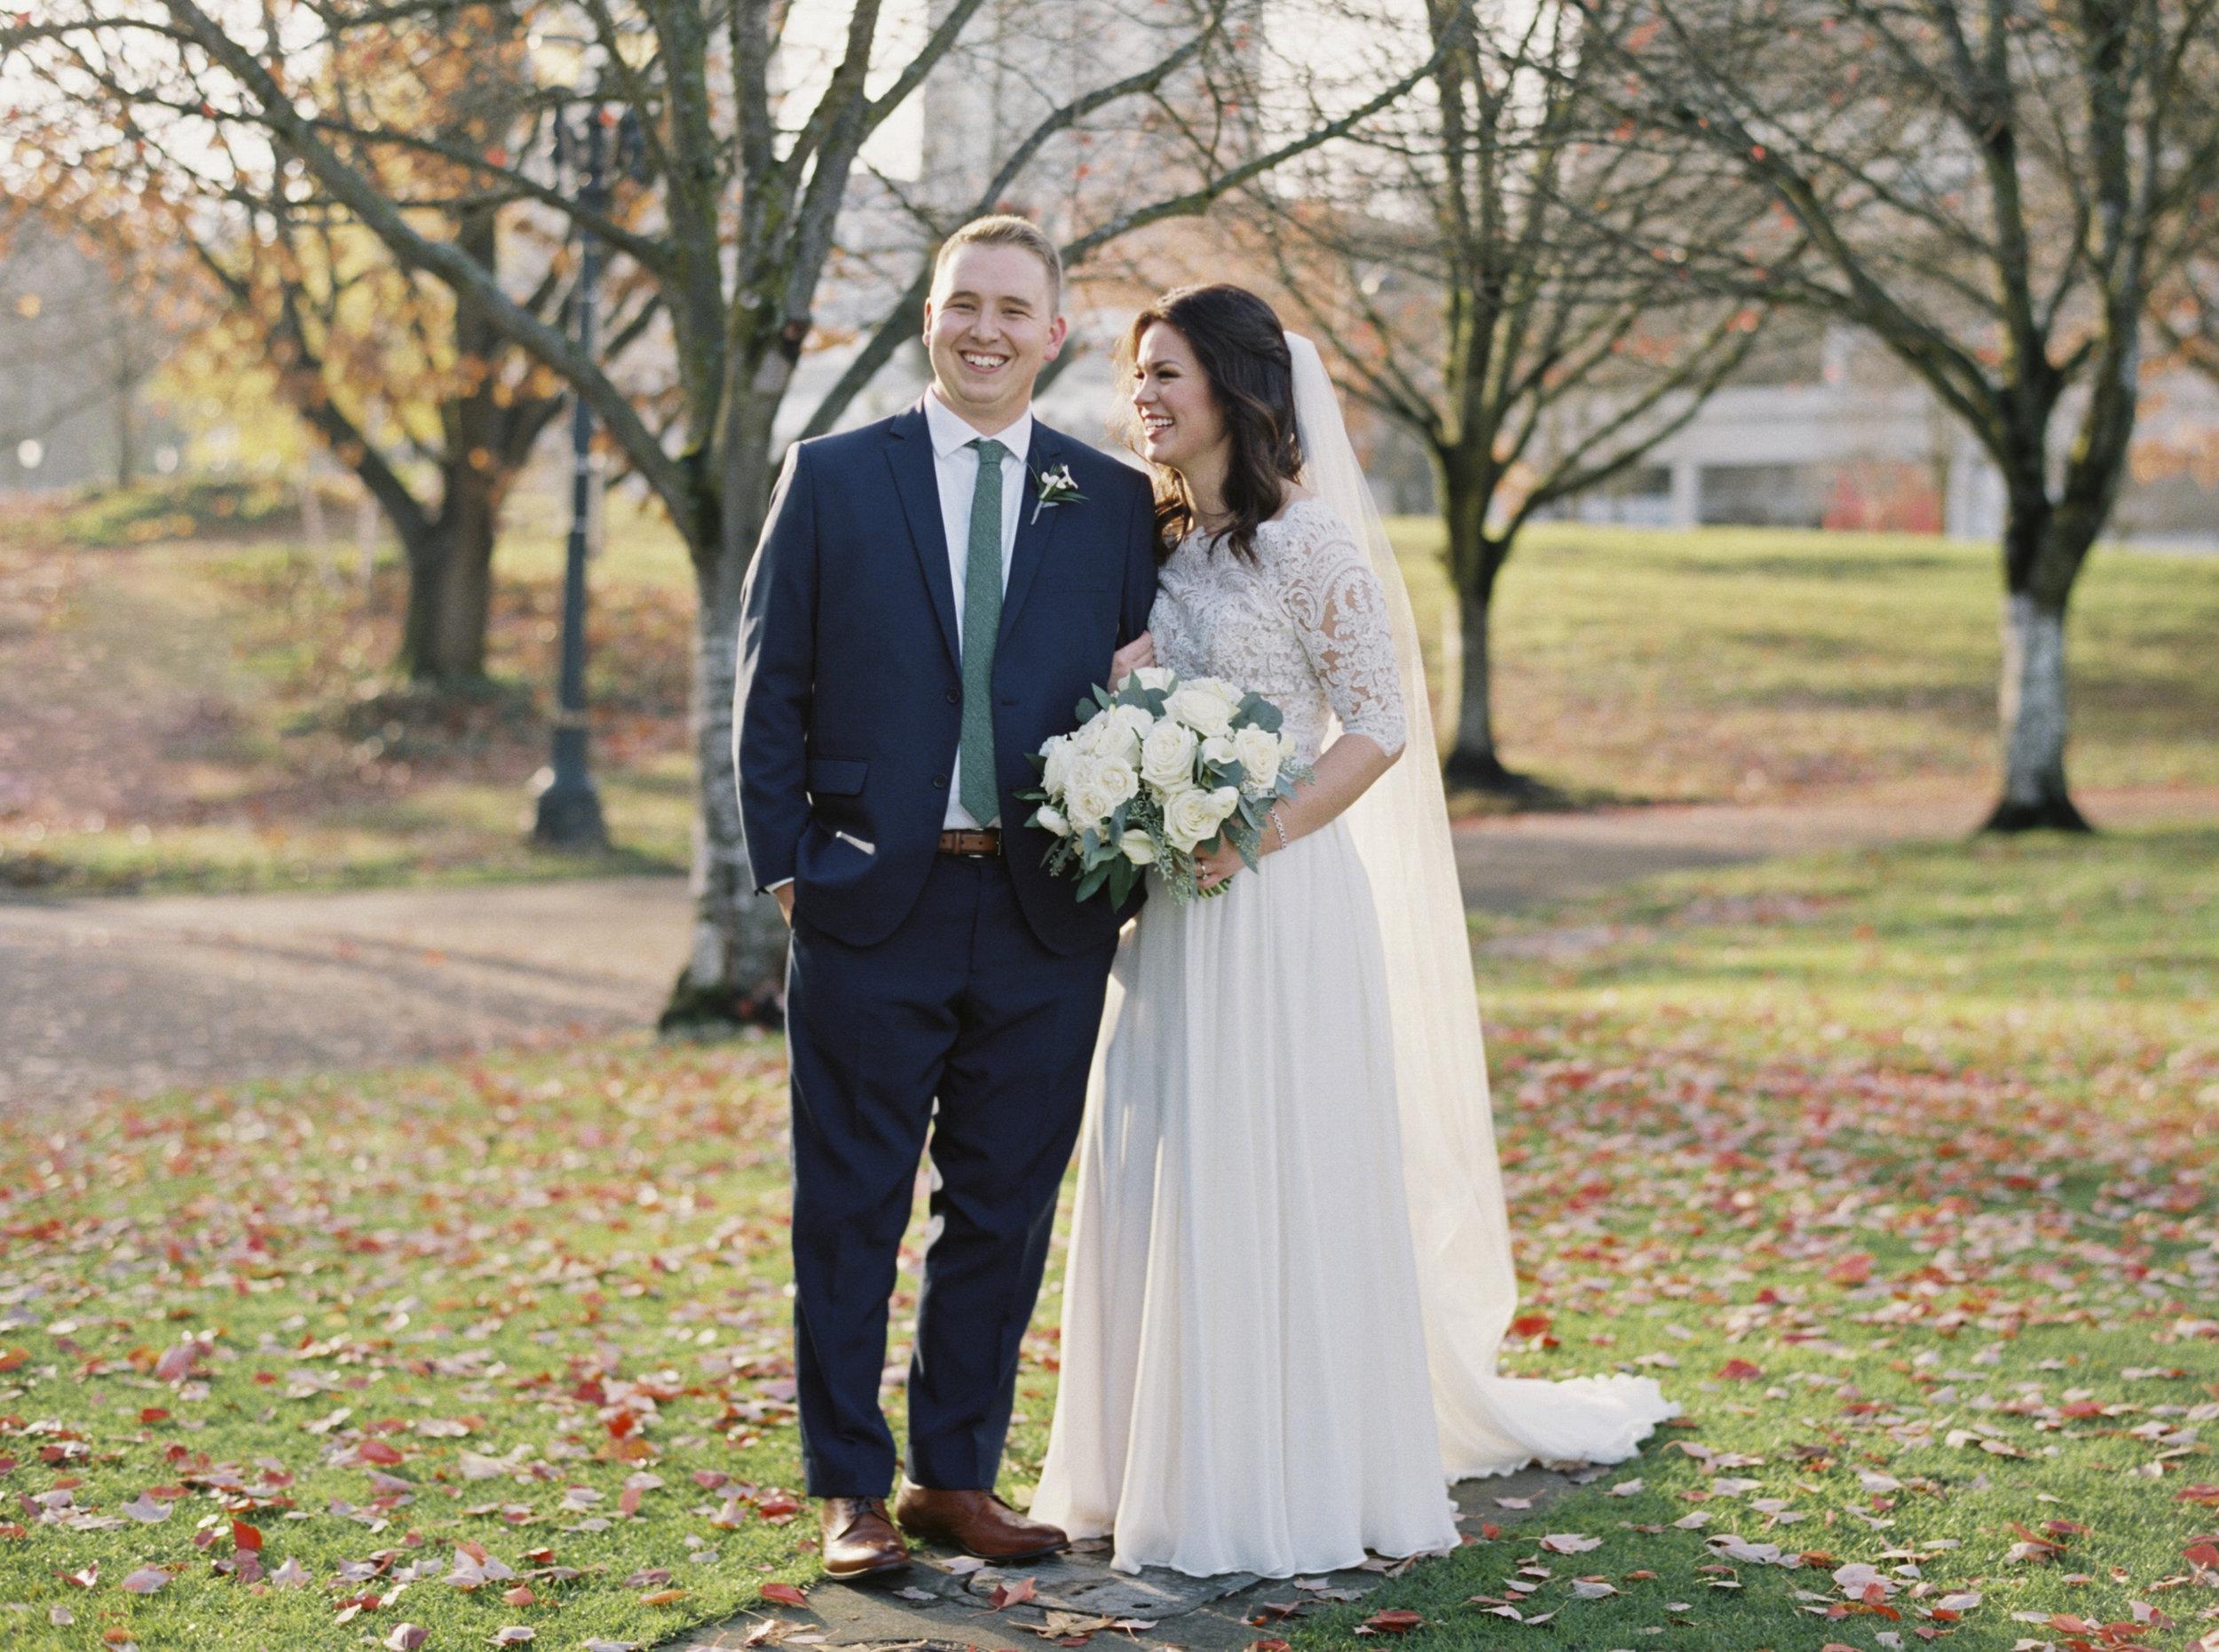 Castaway_Wedding_Photographer_Samantha&Garrett_141.jpg